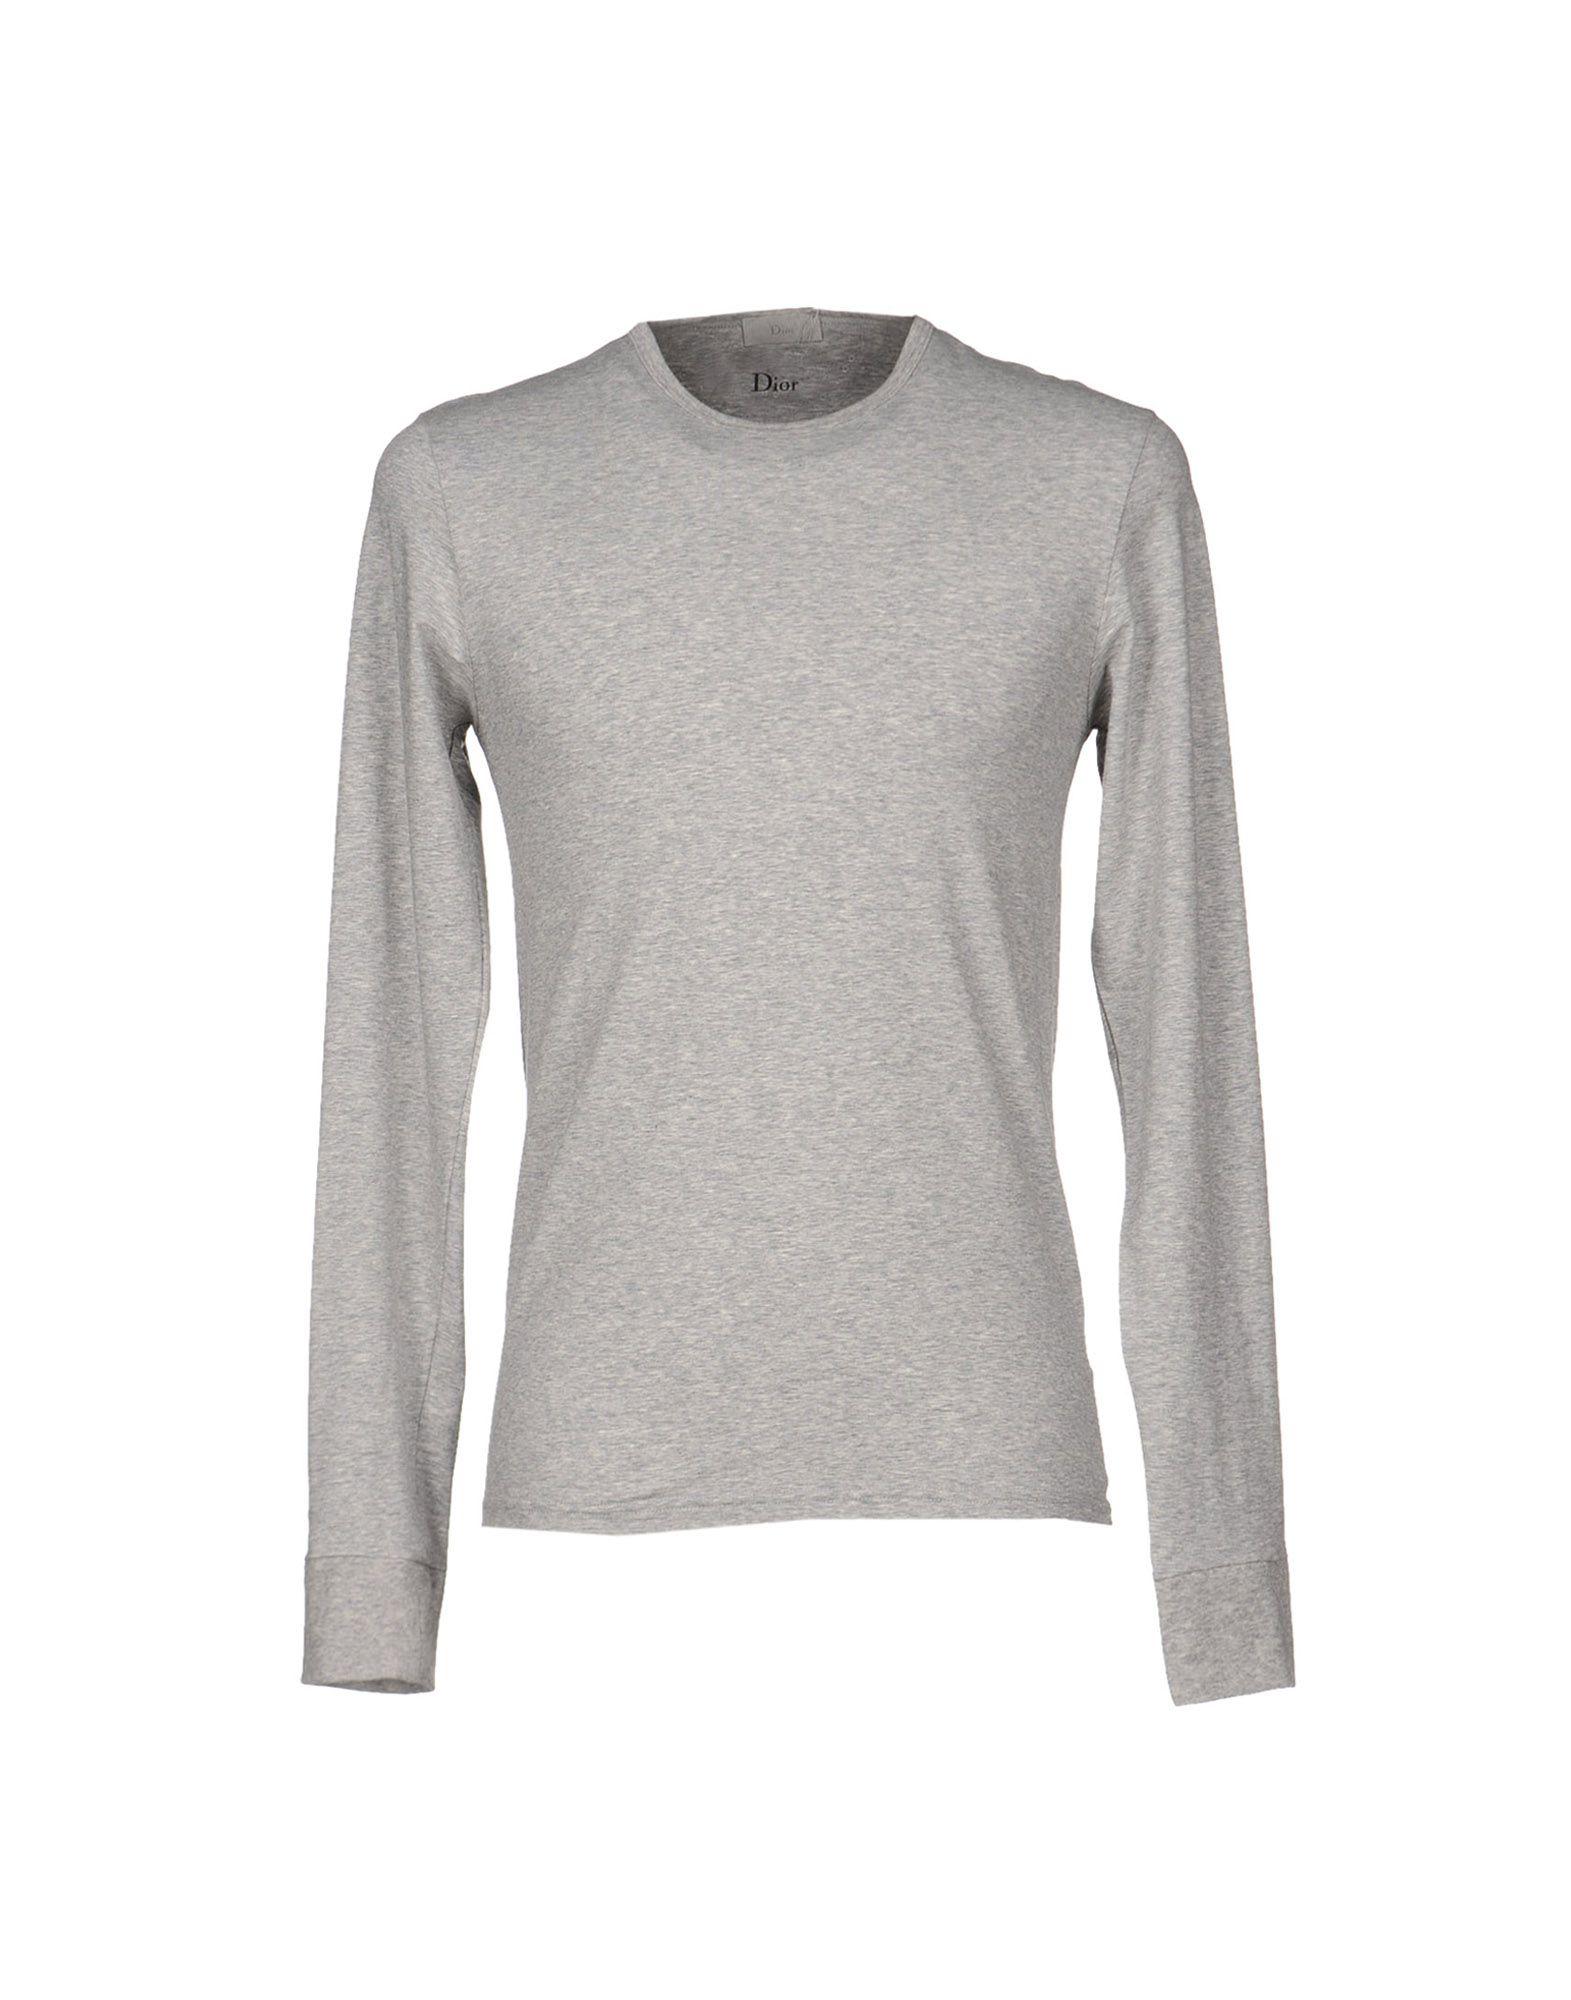 dior homme tshirt in gray for men grey lyst. Black Bedroom Furniture Sets. Home Design Ideas